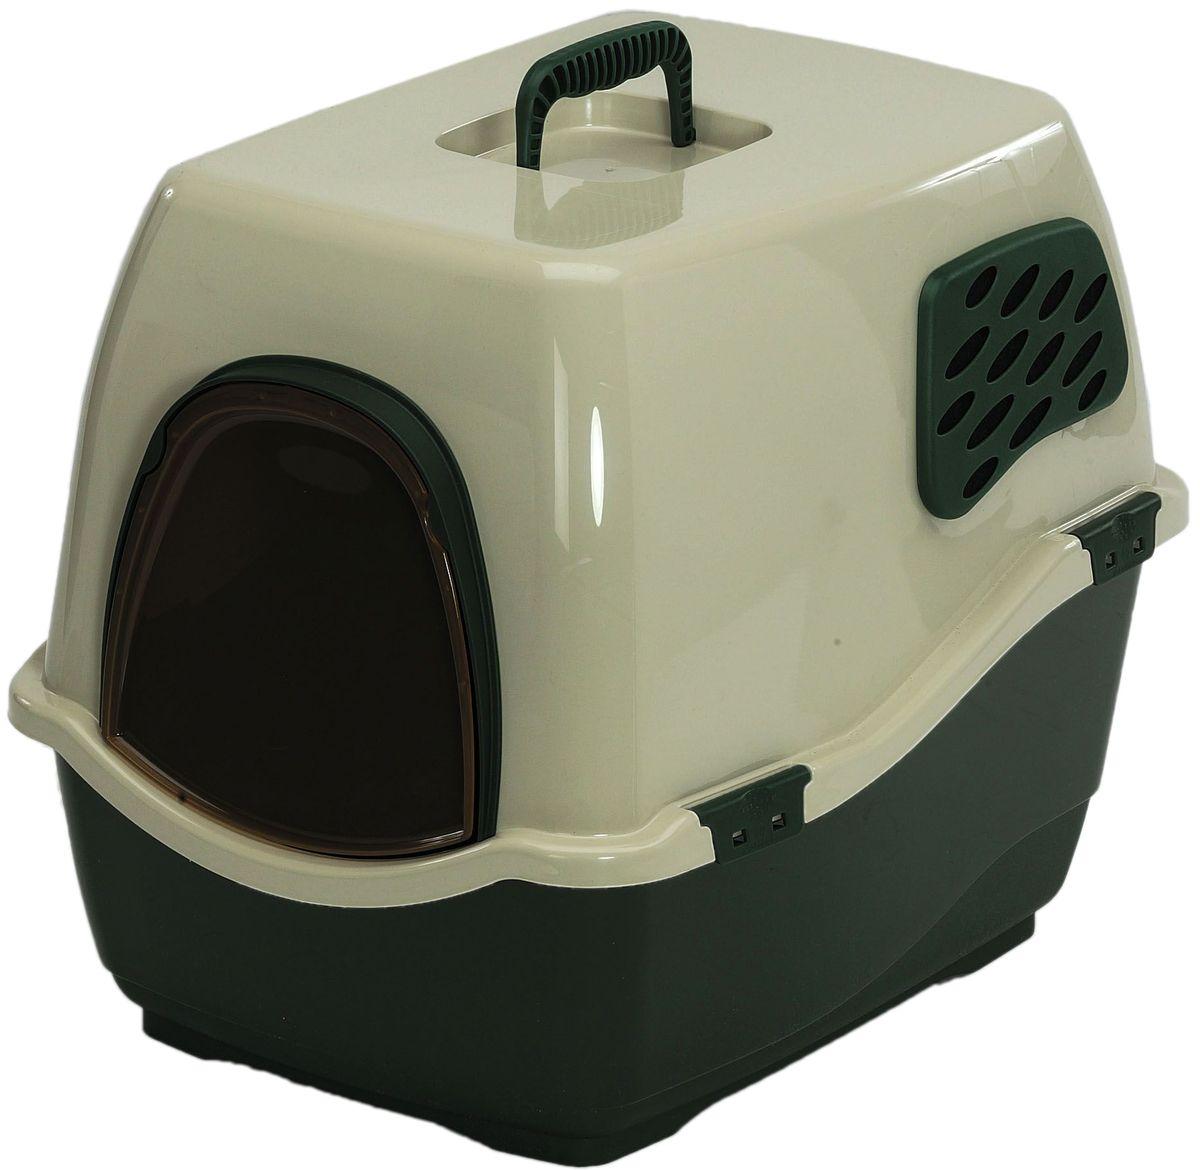 Био-туалет для кошек Marchioro Bill 1F, цвет: зеленый, бежевый, 50 х 40 х 42 см цена